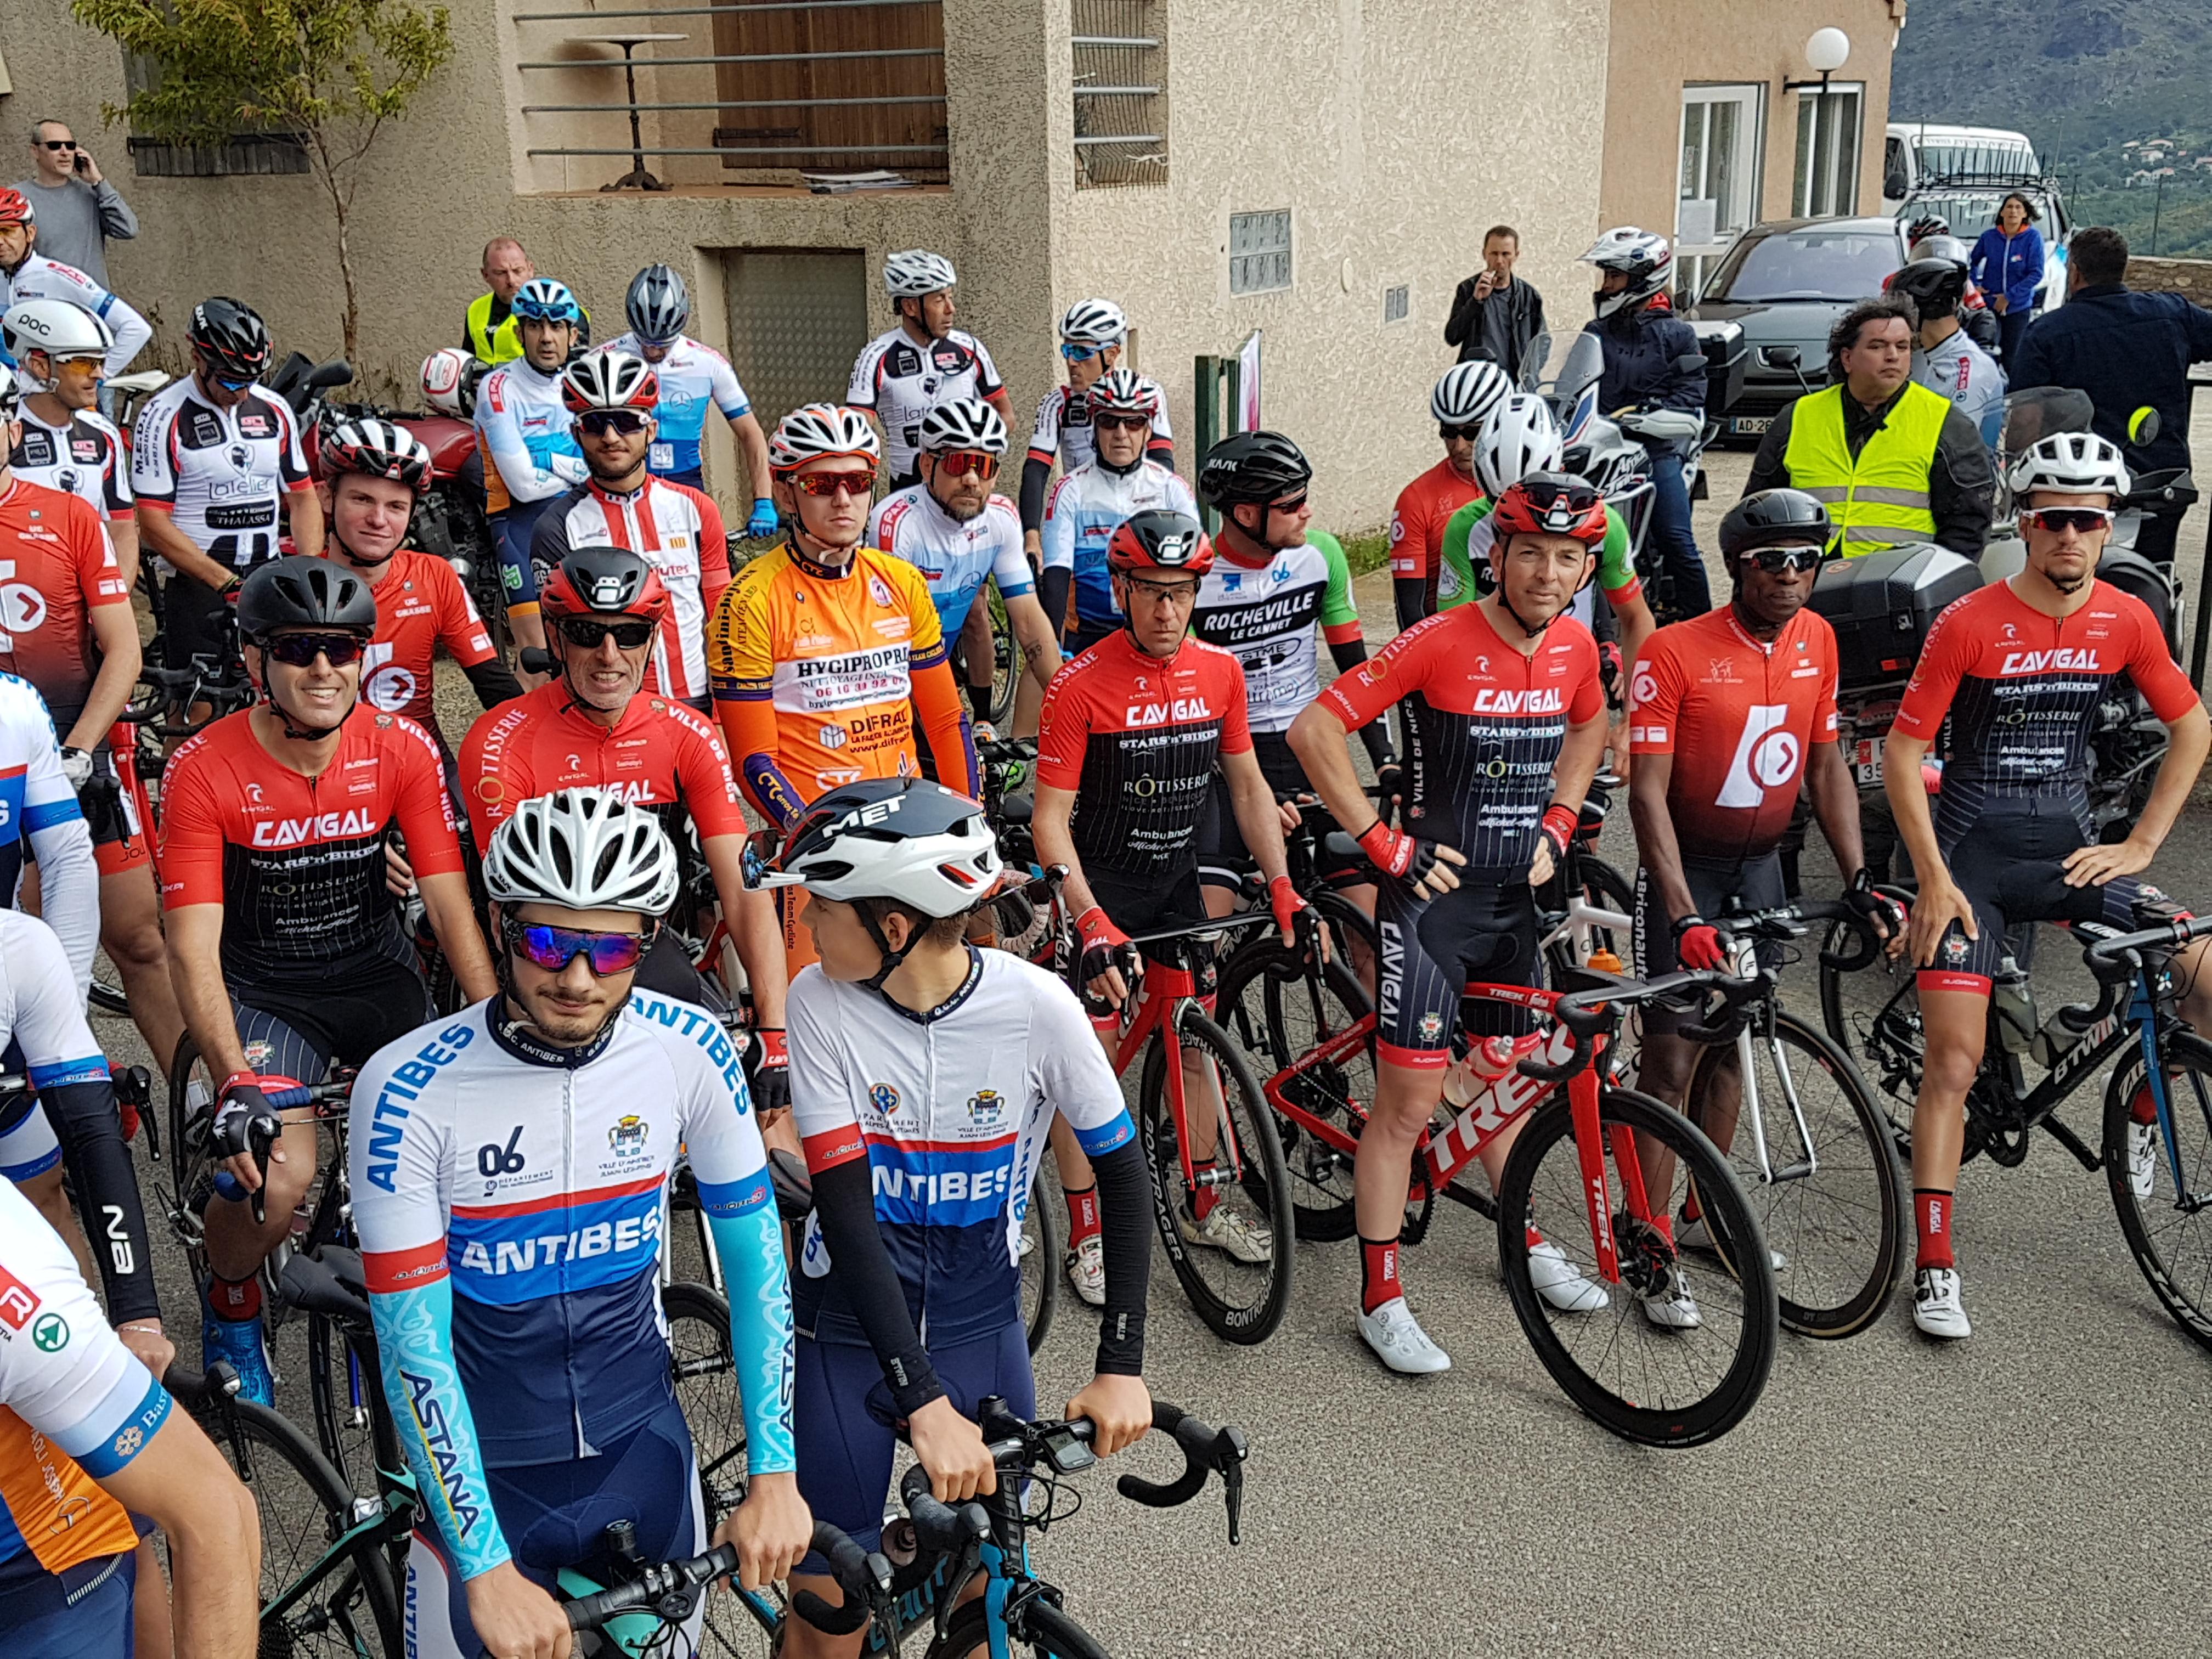 Calendrier Fsgt Cyclisme 2019.Fsgt Cyclisme 06